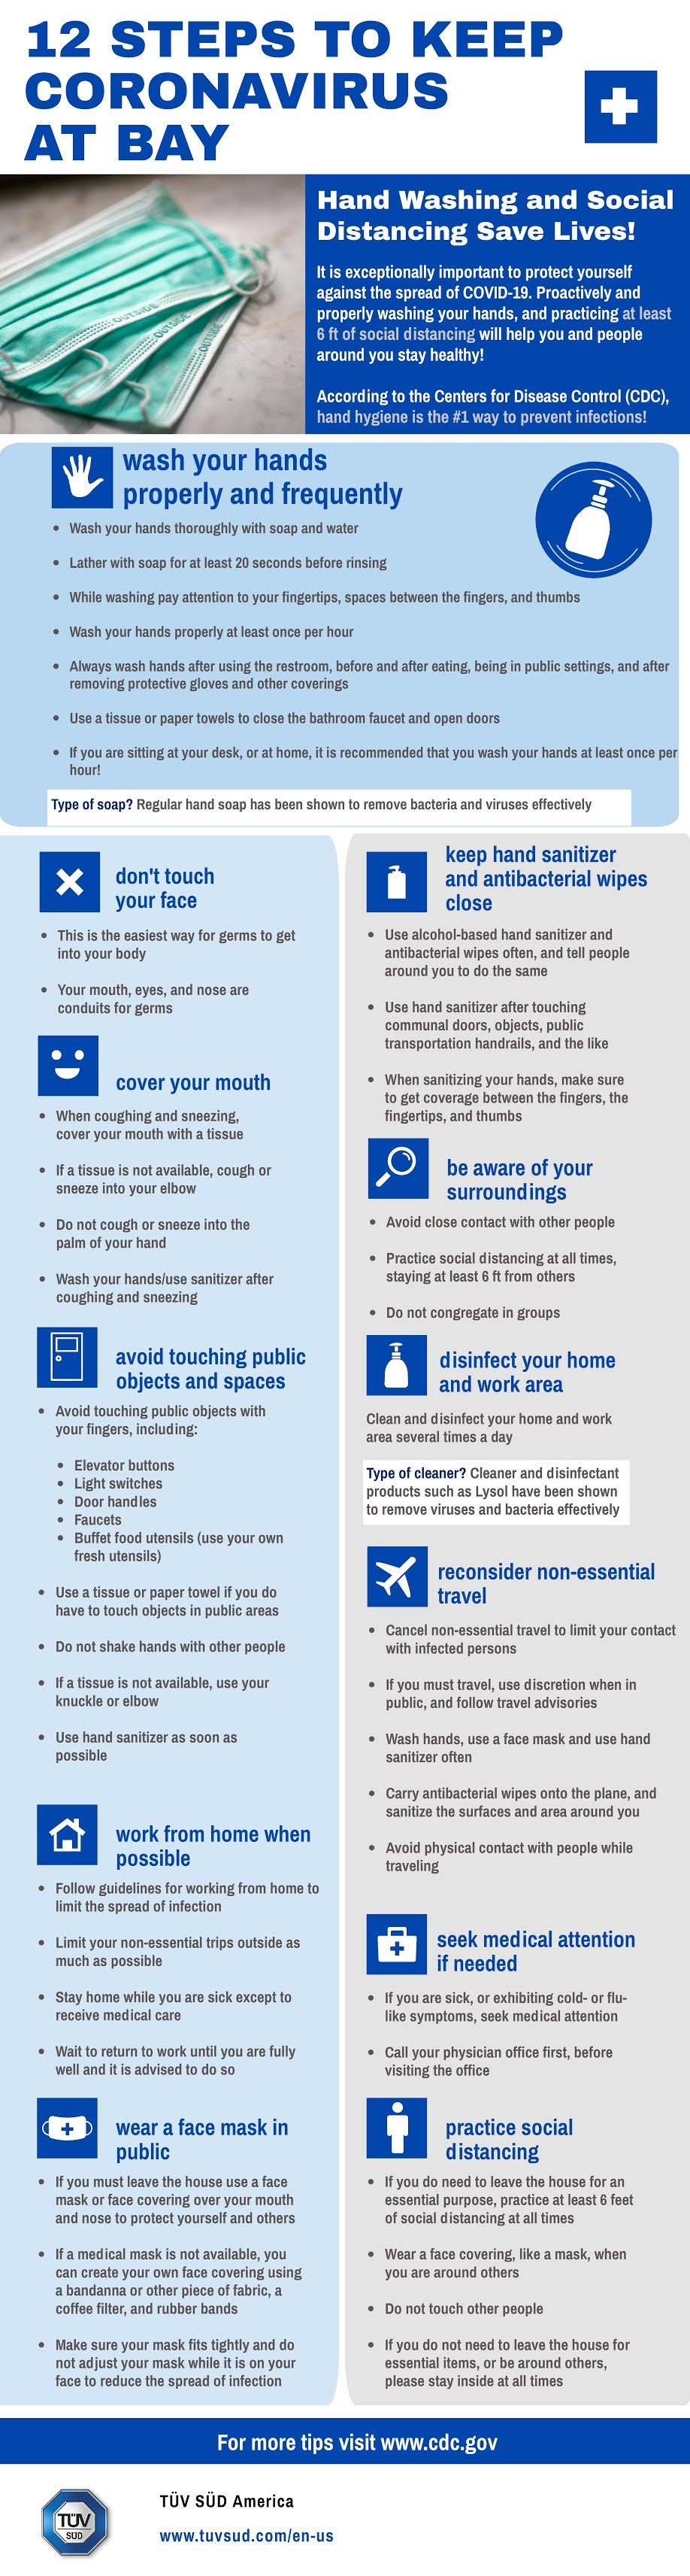 12 Steps To Keep Coronavirus At Bay #infographic